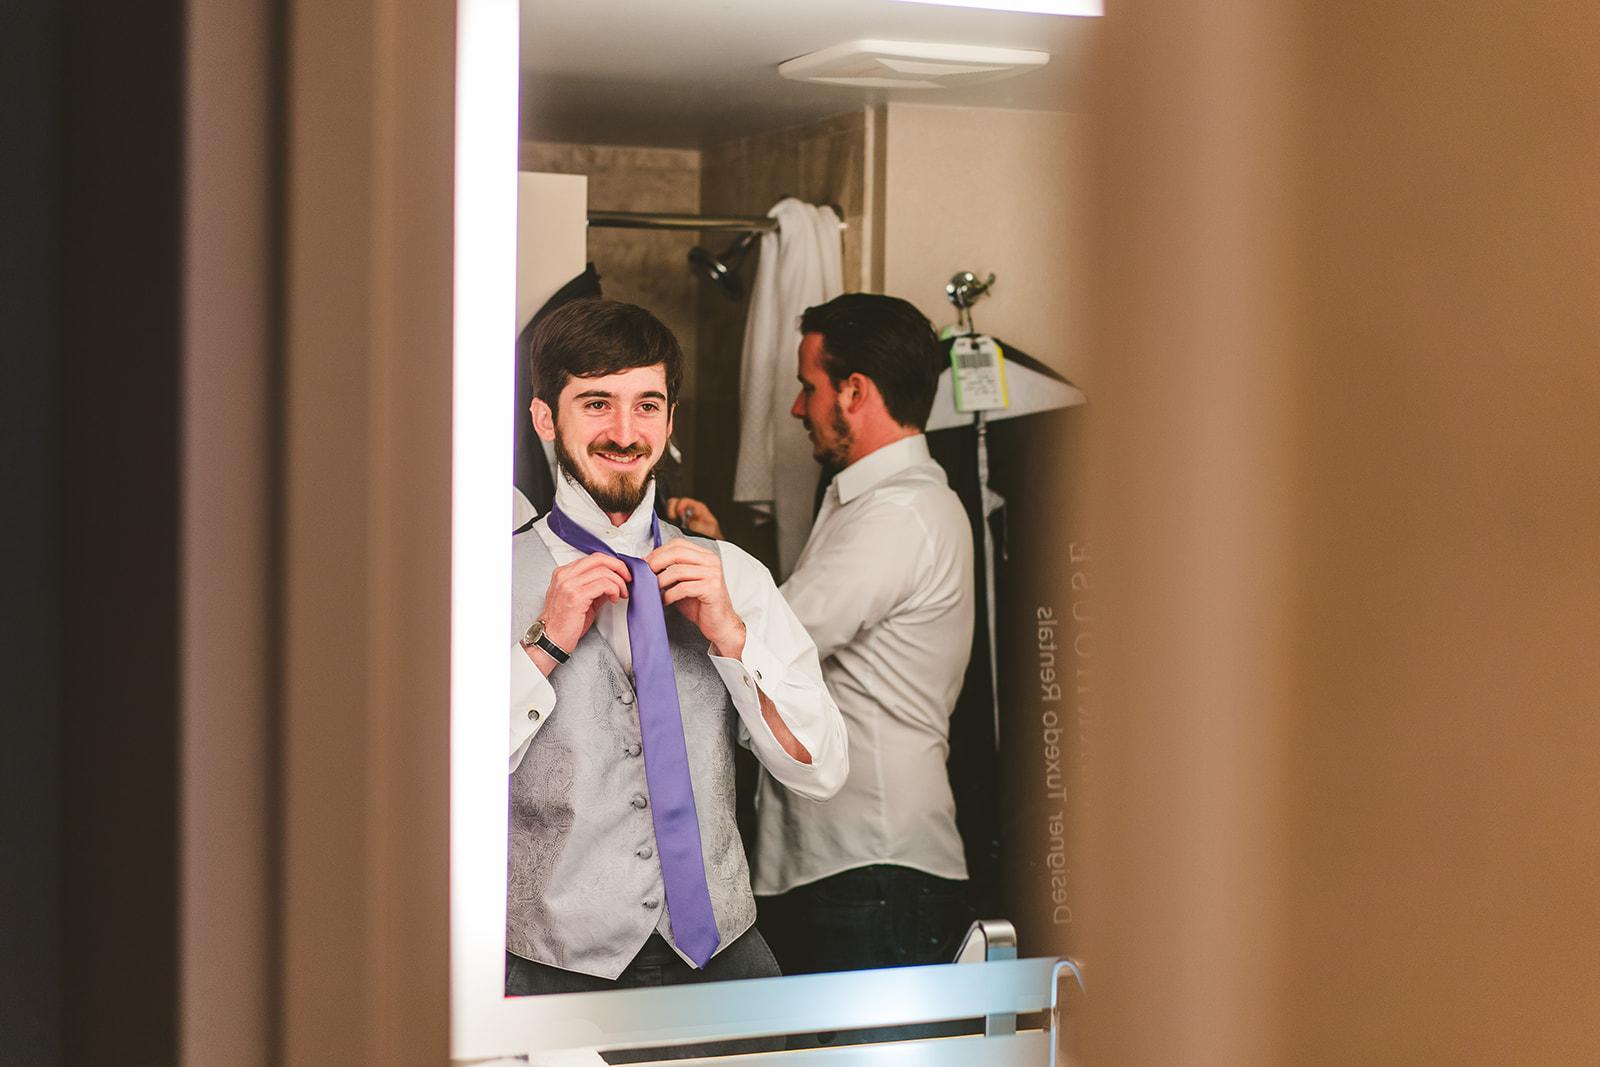 10-20-18-Katy-Kevin-Wedding-Embassy_Suites-Alexandria-VA-1058_websize.jpg